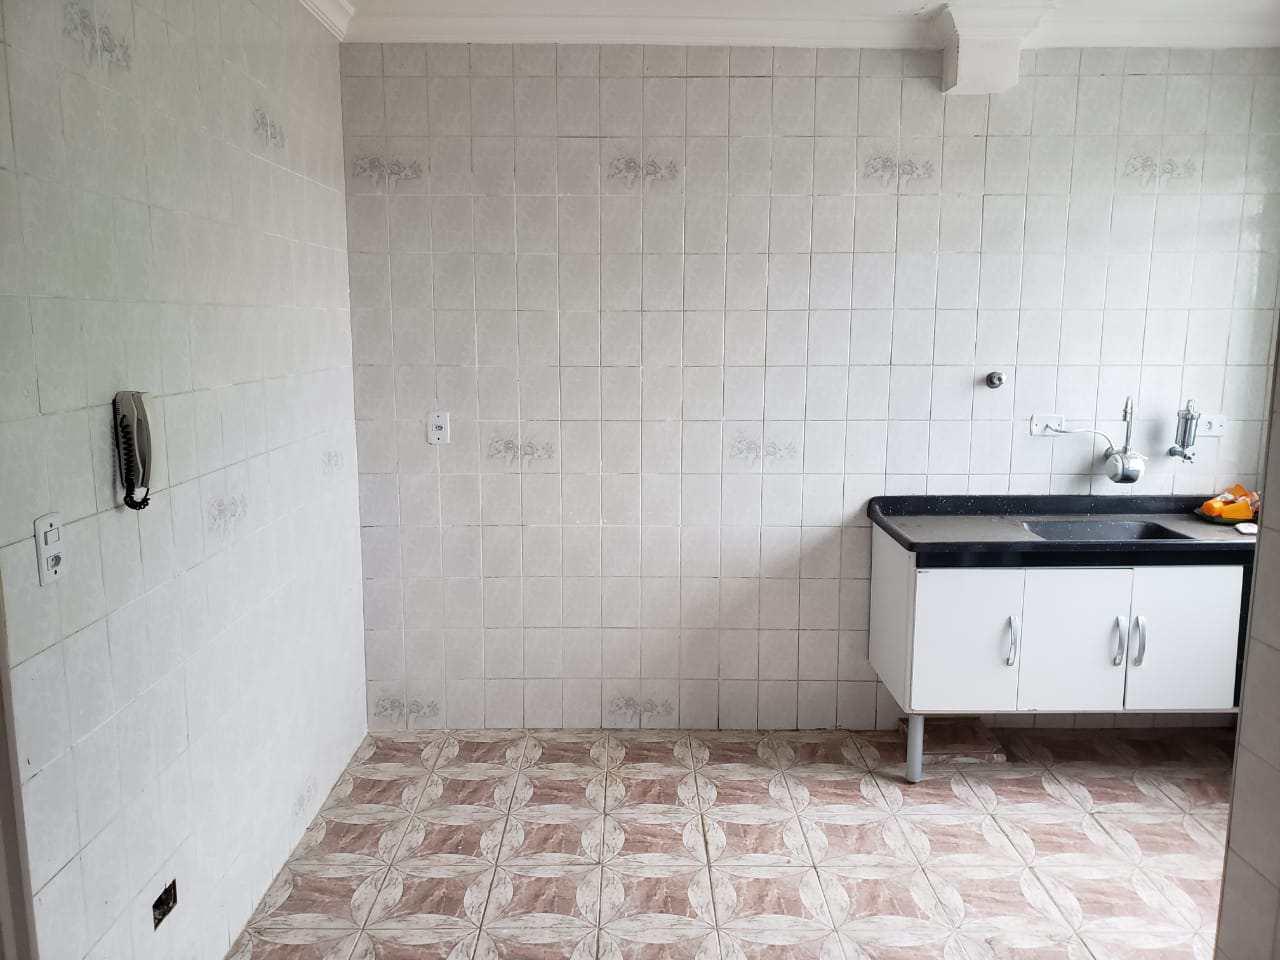 Apartamento com 2 dorms, Cidade Satélite Santa Bárbara, São Paulo - R$ 180 mil, Cod: 11364